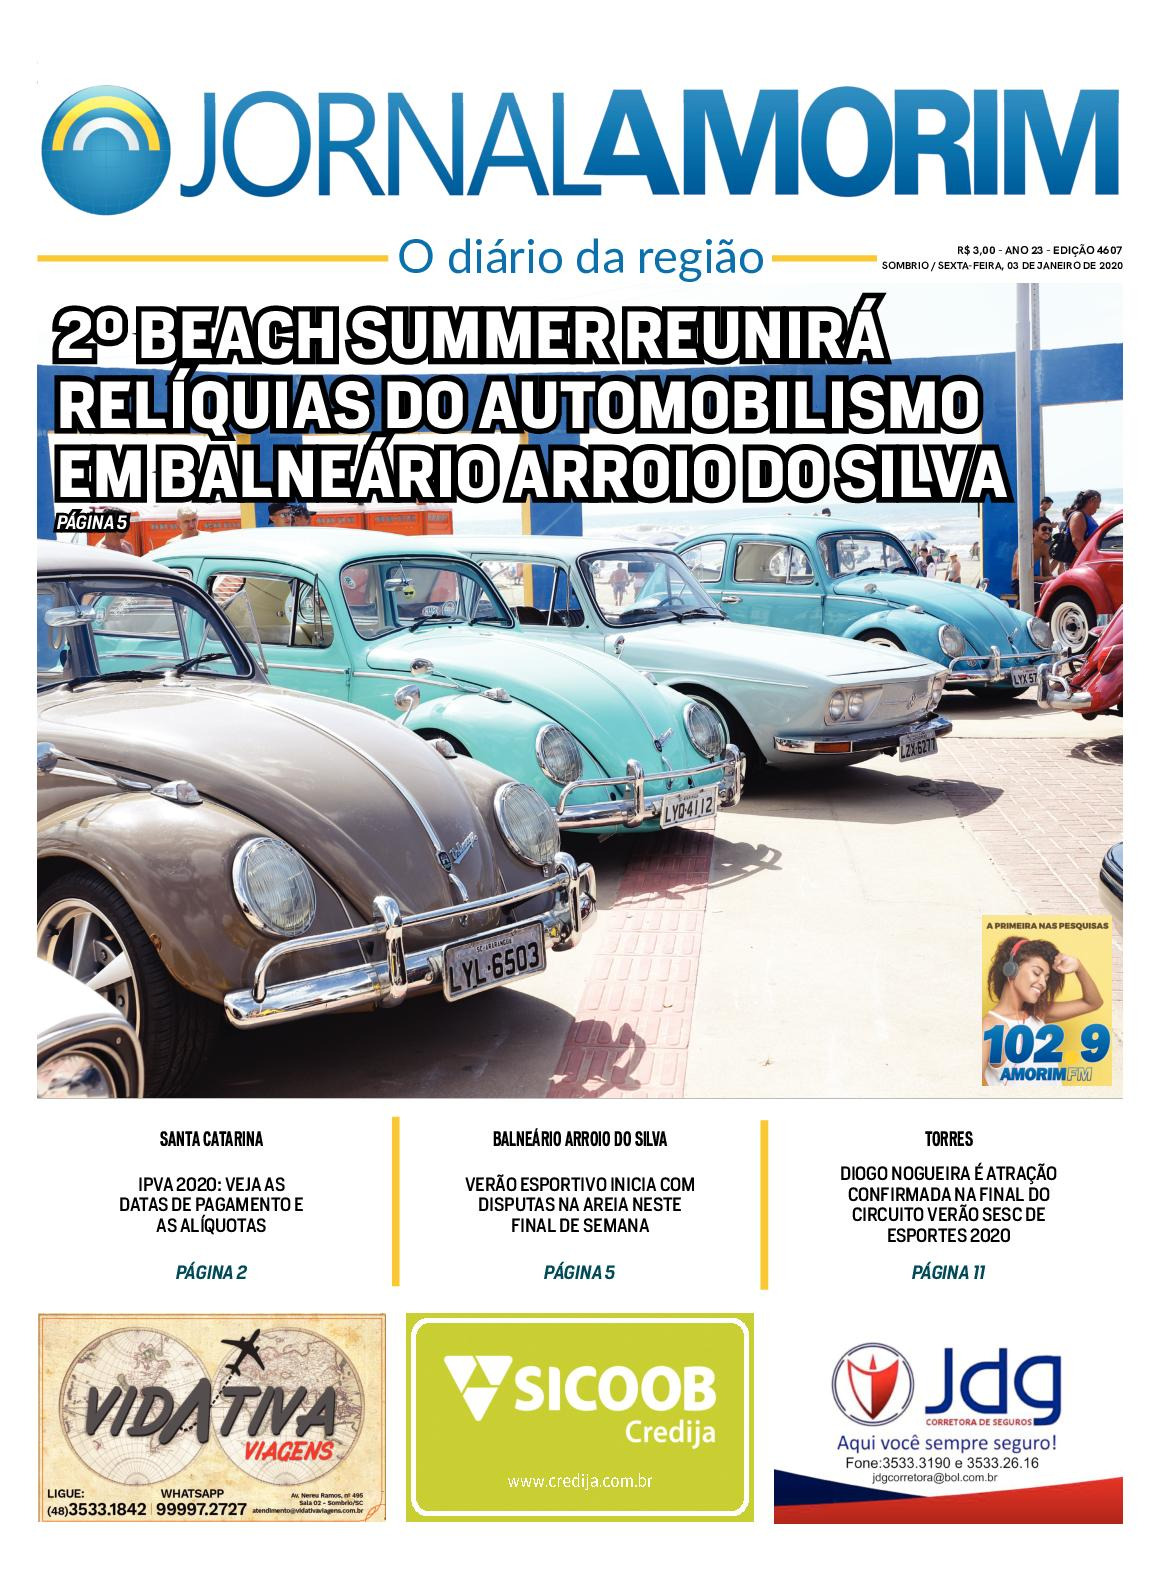 Jornal Amorim 4607 Sexta 03 01 2020